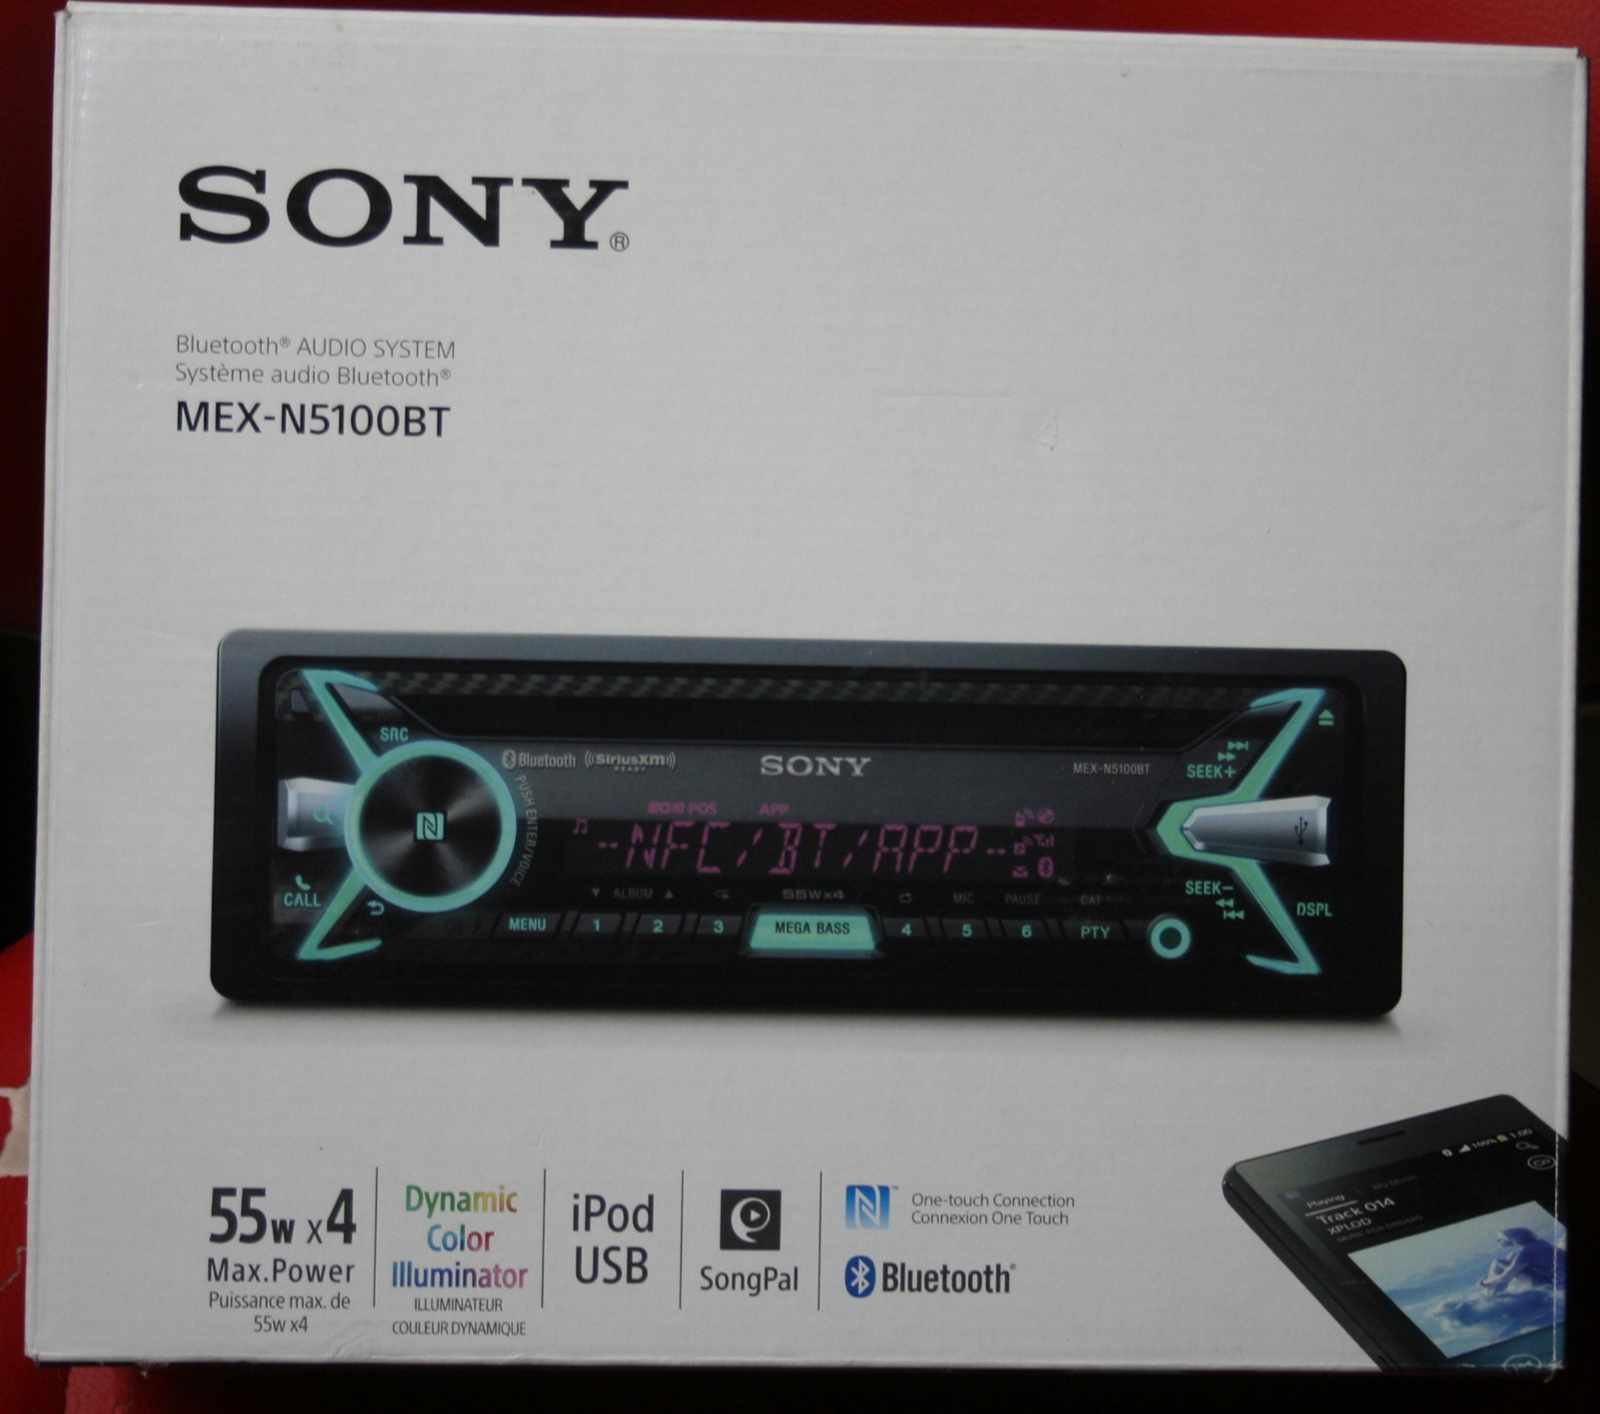 sony mex n5100bt bluetooth cd car stereo receiver ebay. Black Bedroom Furniture Sets. Home Design Ideas